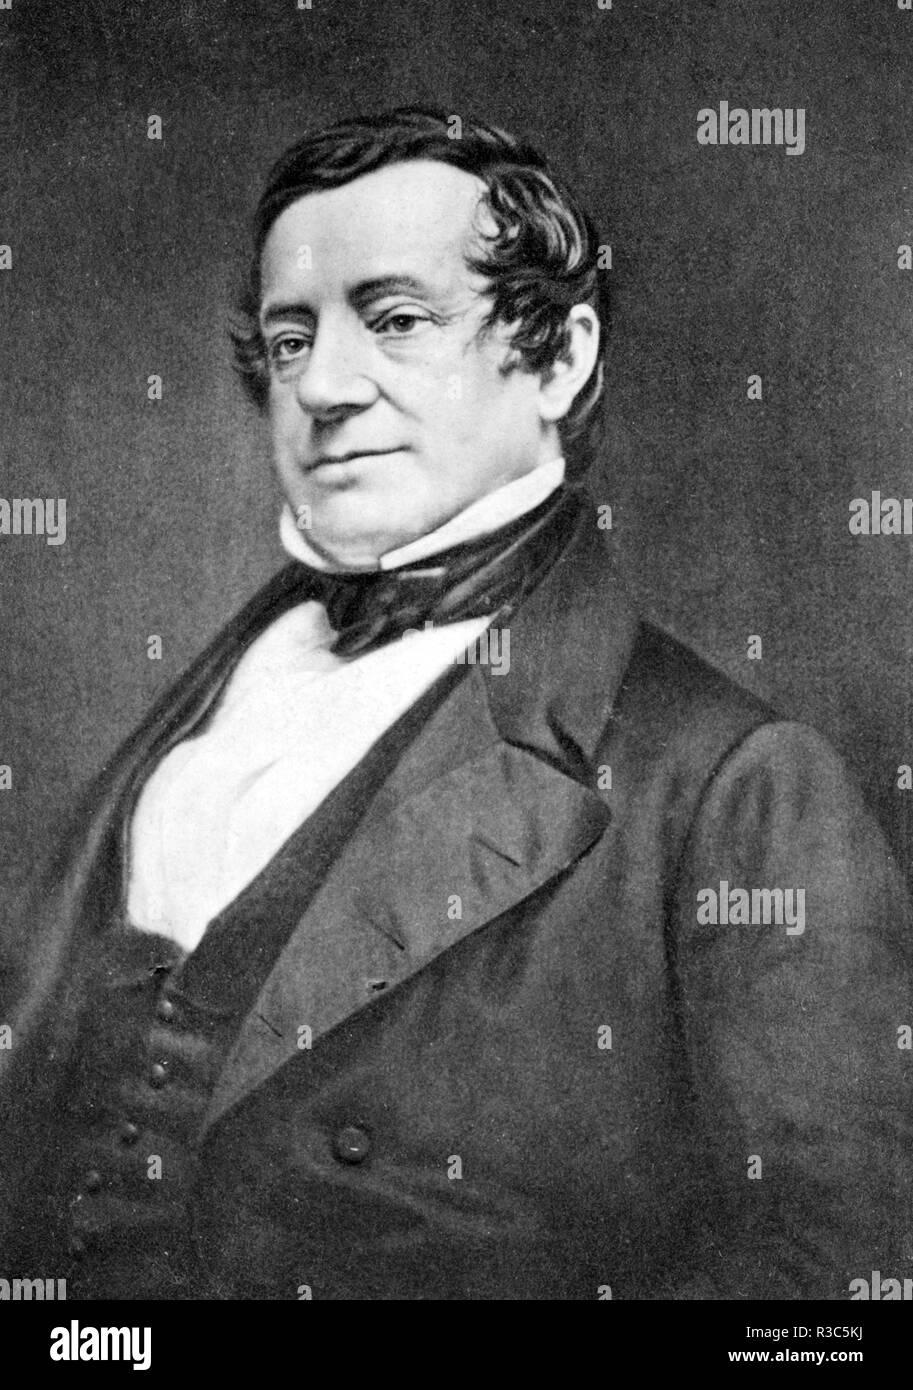 WASHINGTON IRVING (1783-1859) American writer and diplomat - Stock Image